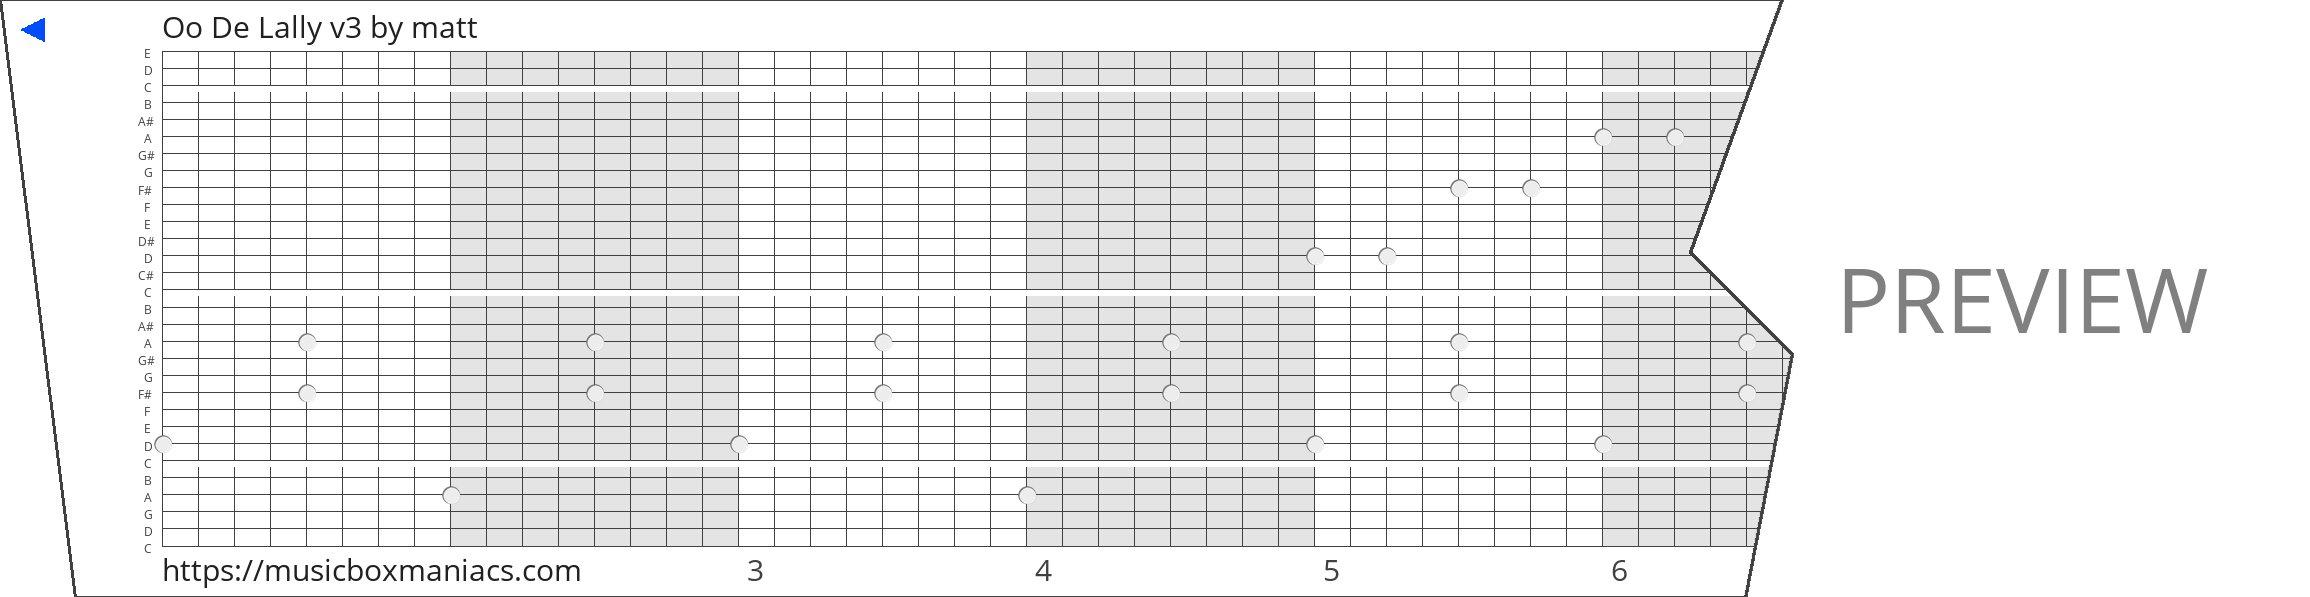 Oo De Lally v3 30 note music box paper strip